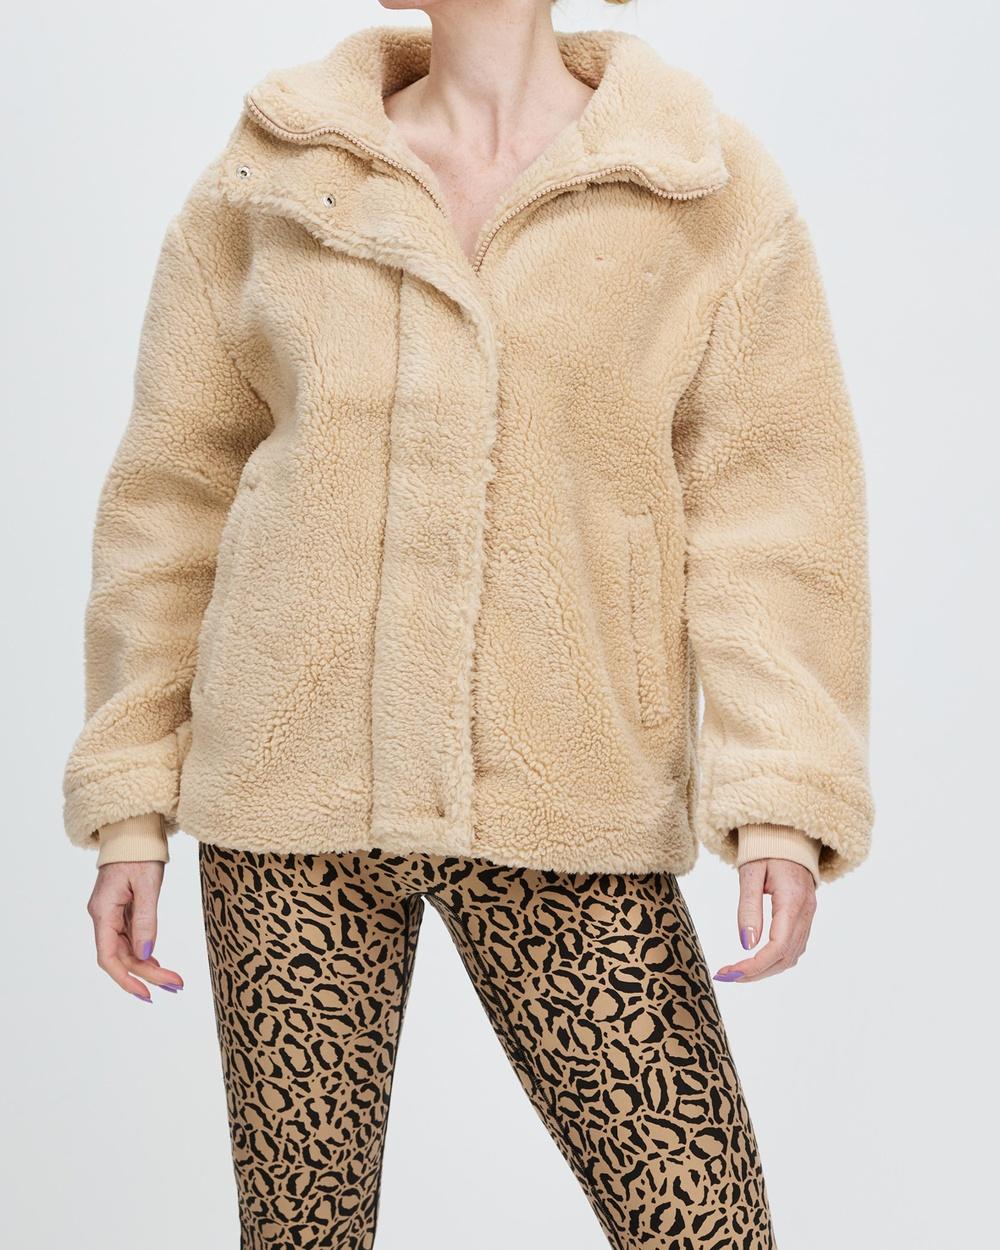 The Upside Aspen Jacket Coats & Jackets Hazelnut